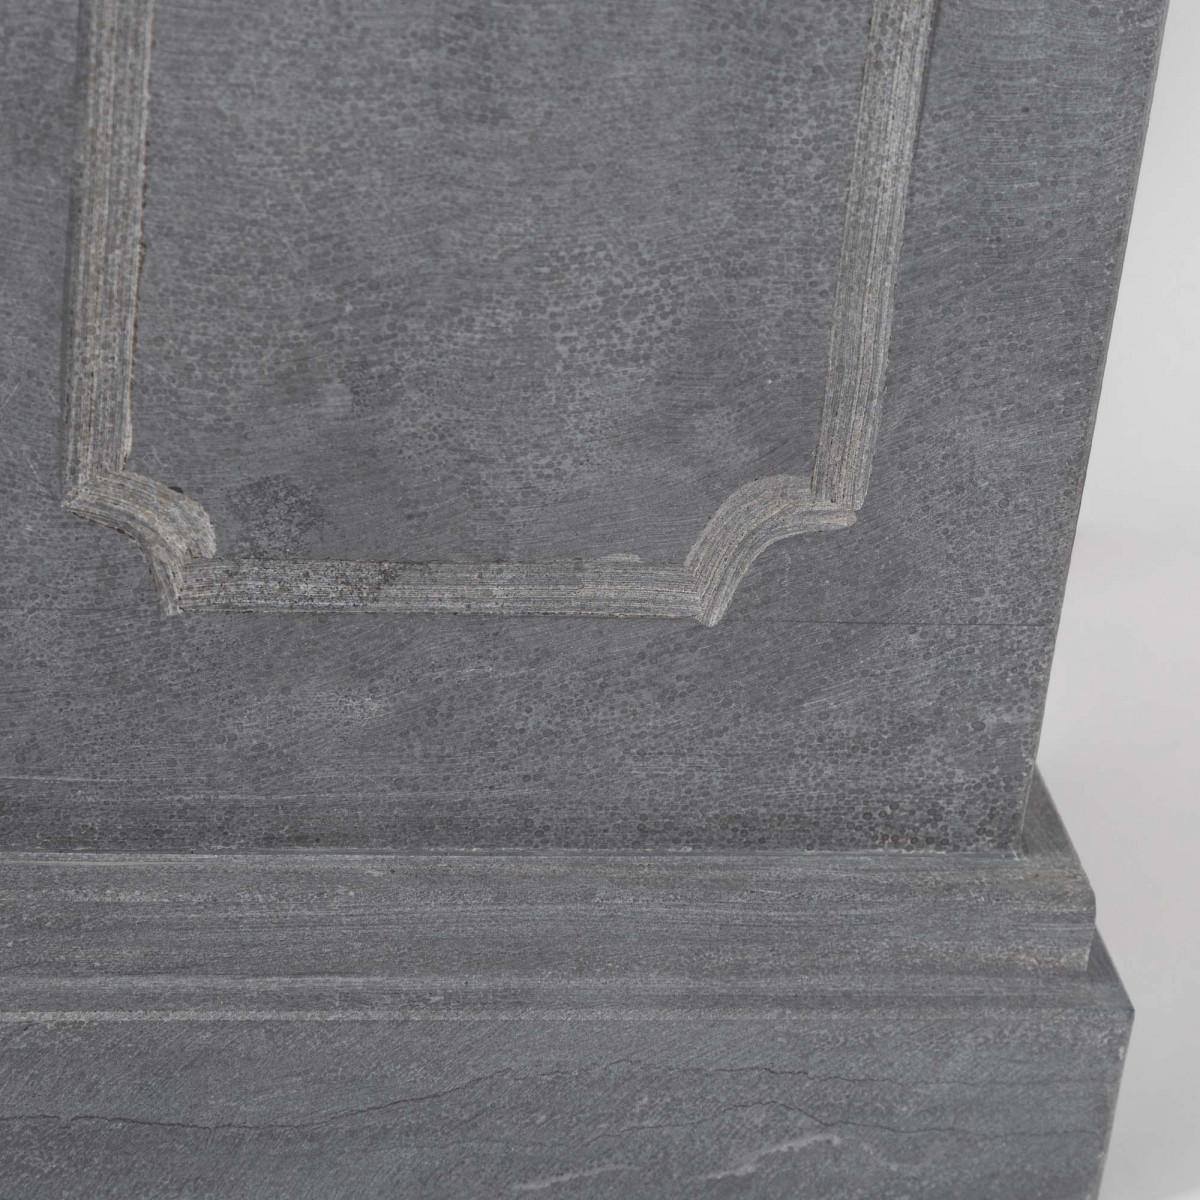 Zonnewijzer sokkel SB106 - KS Verlichting